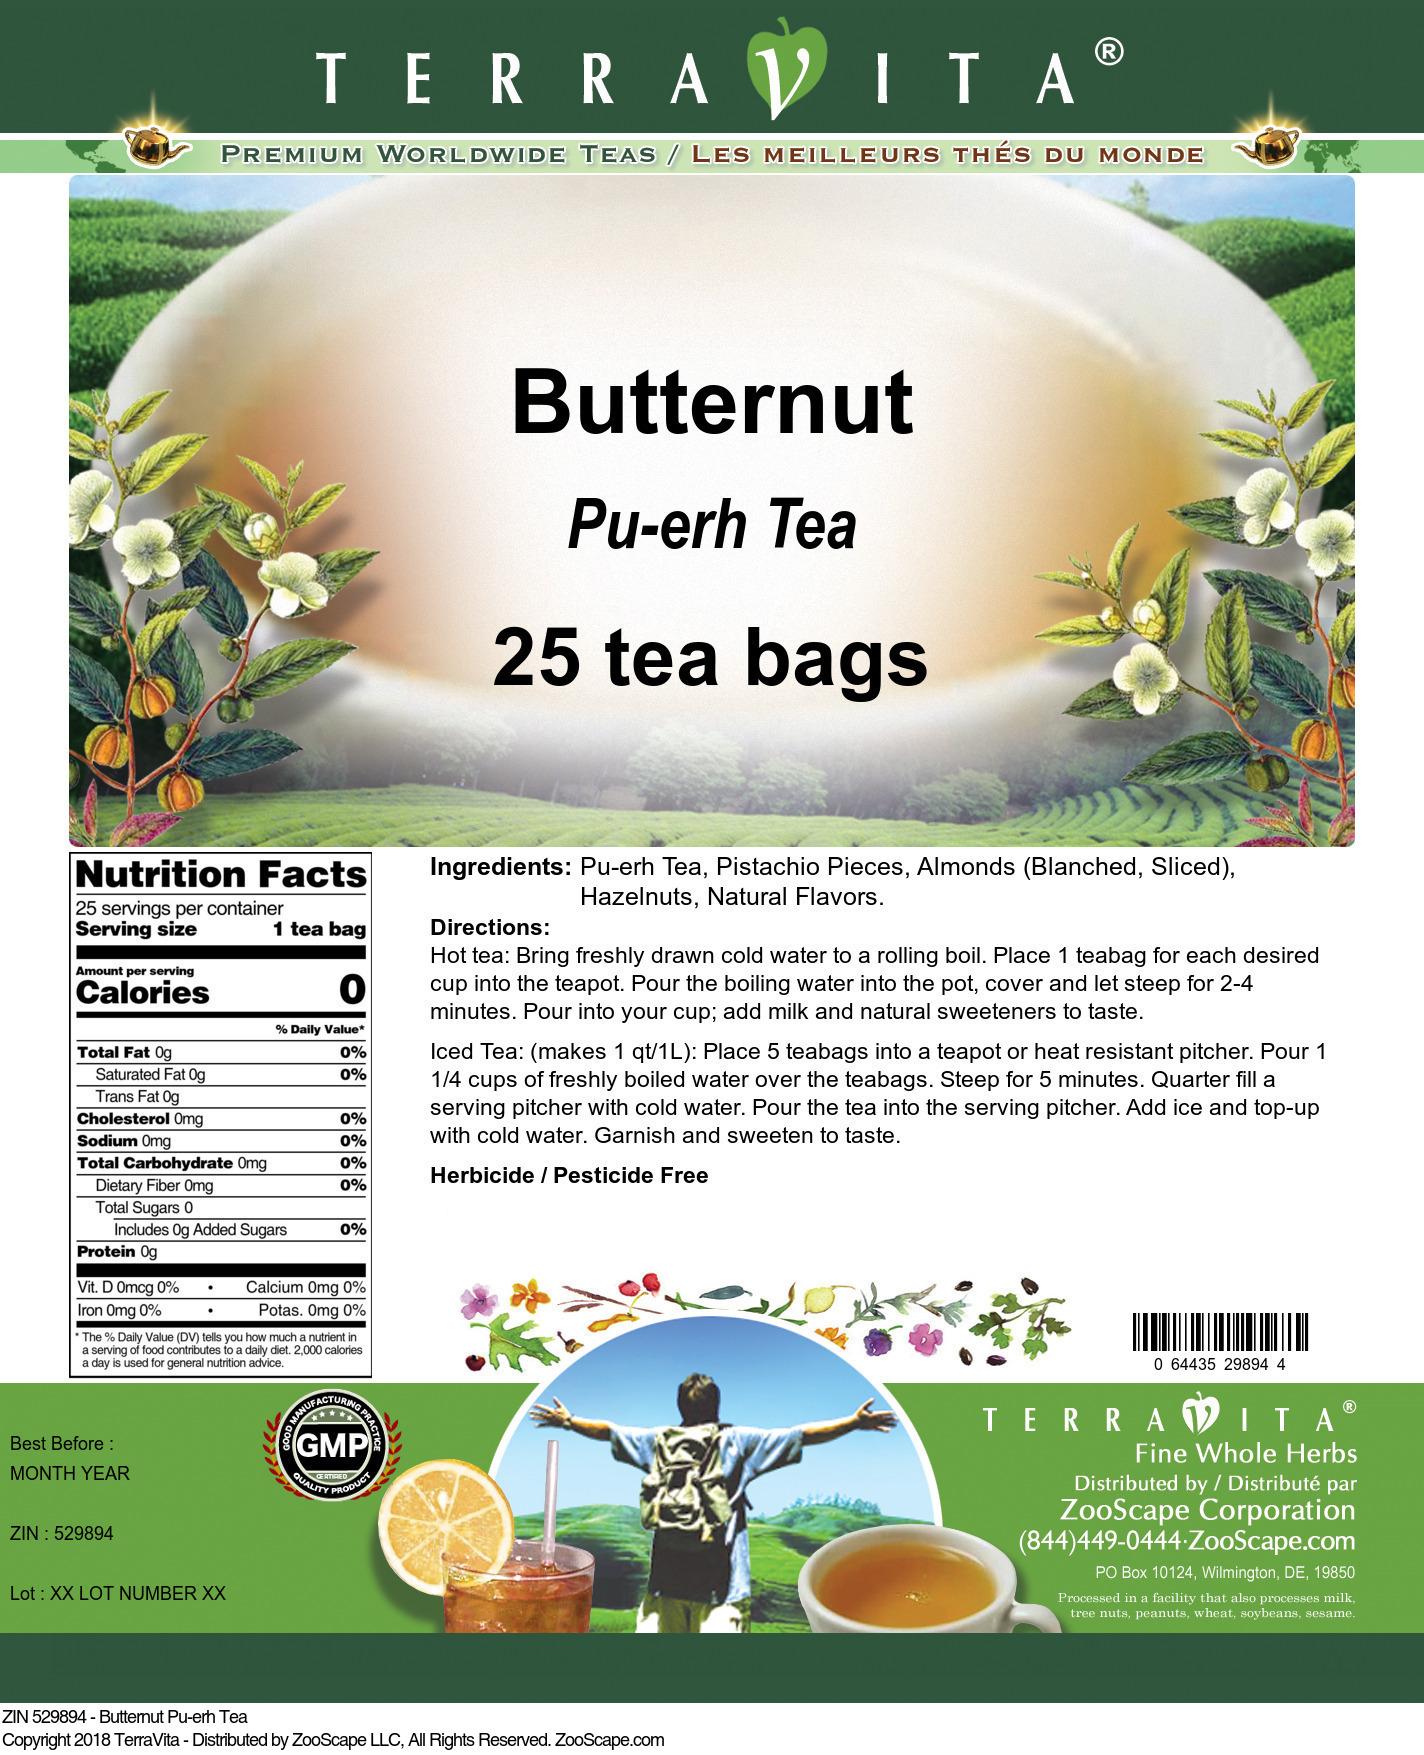 Butternut Pu-erh Tea